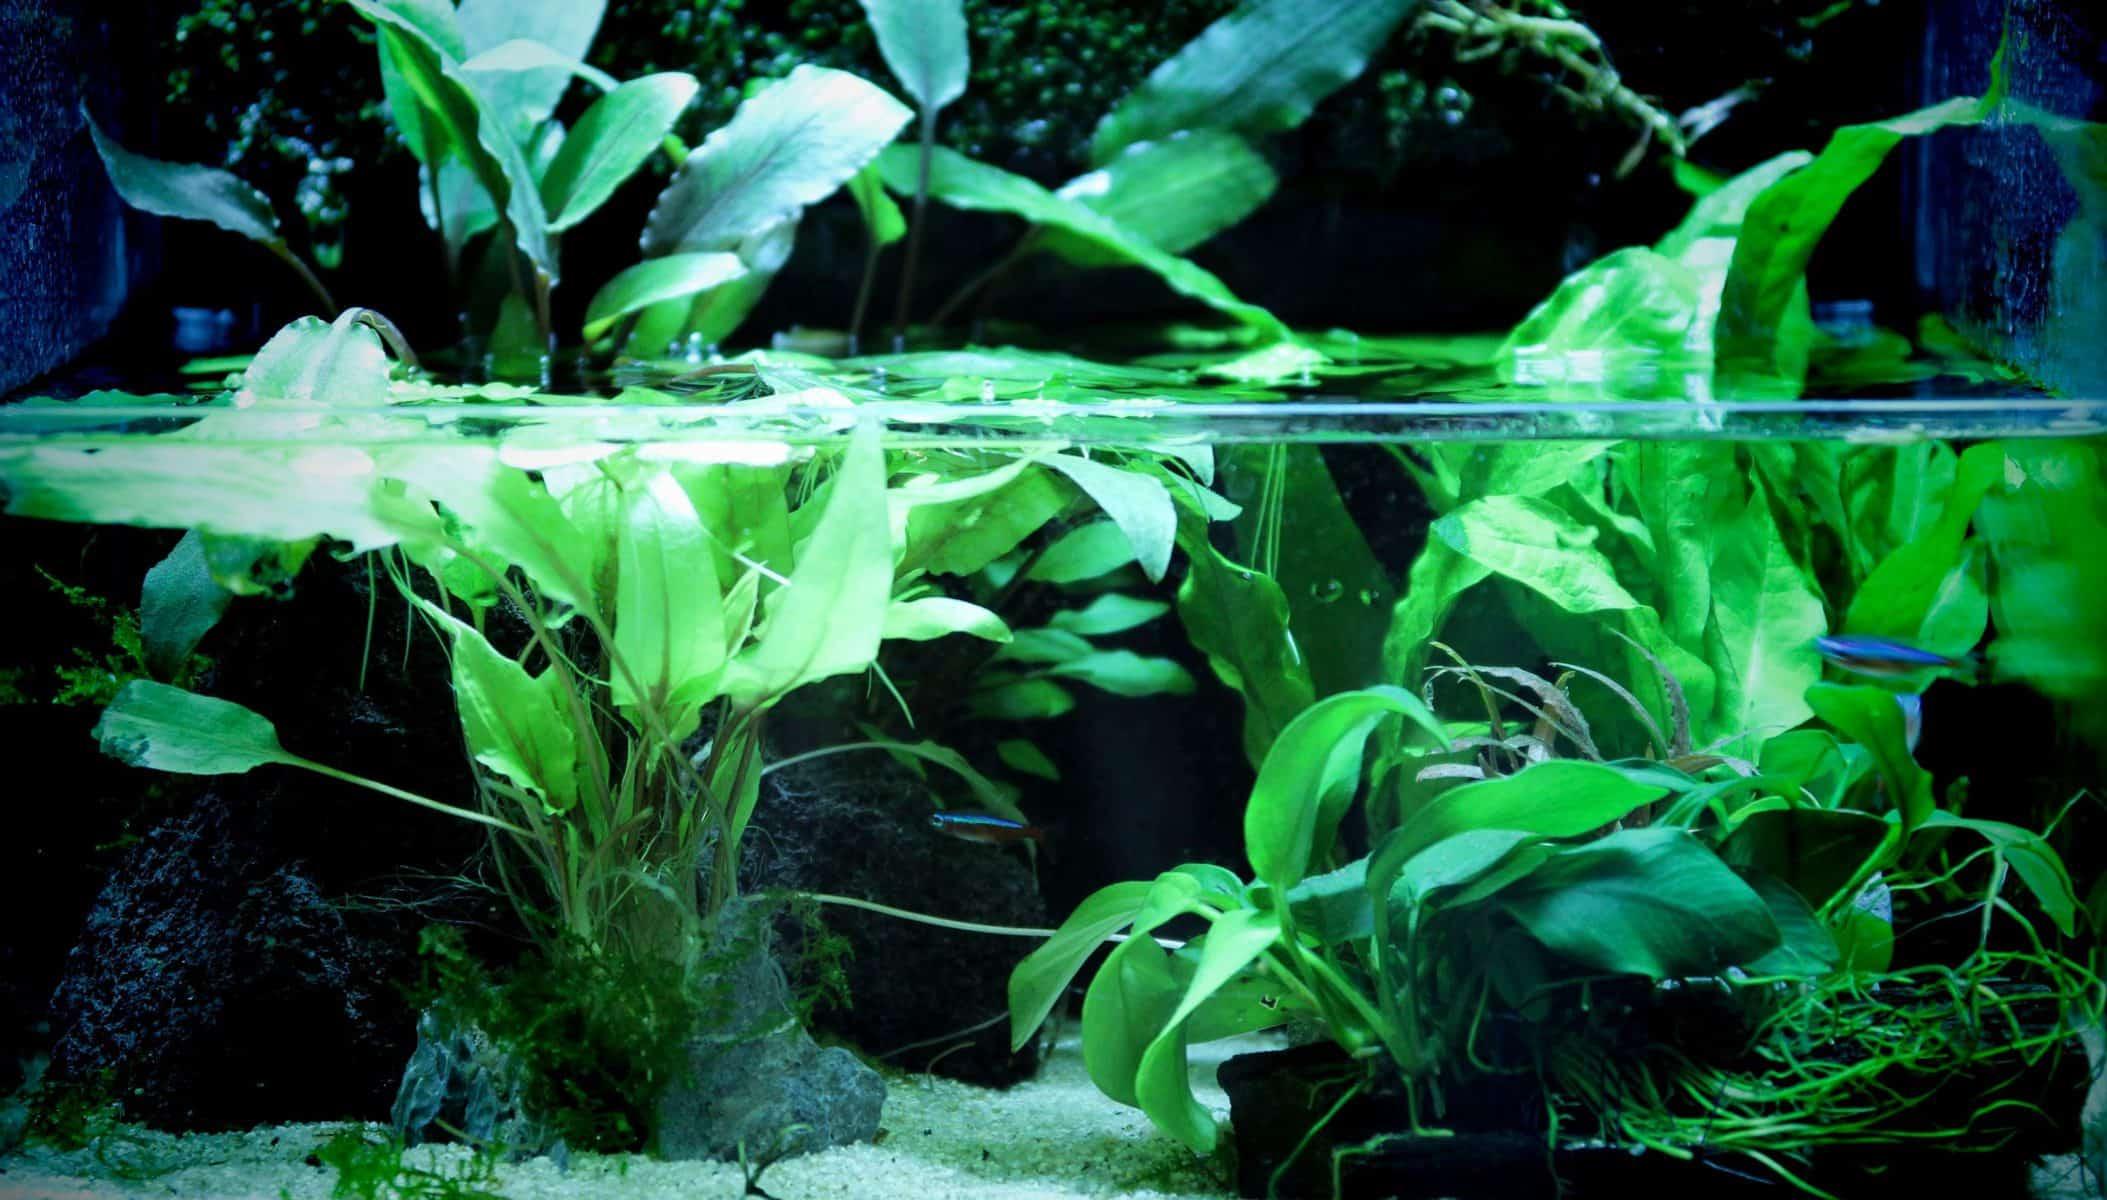 Aquarium Plants: Coontail